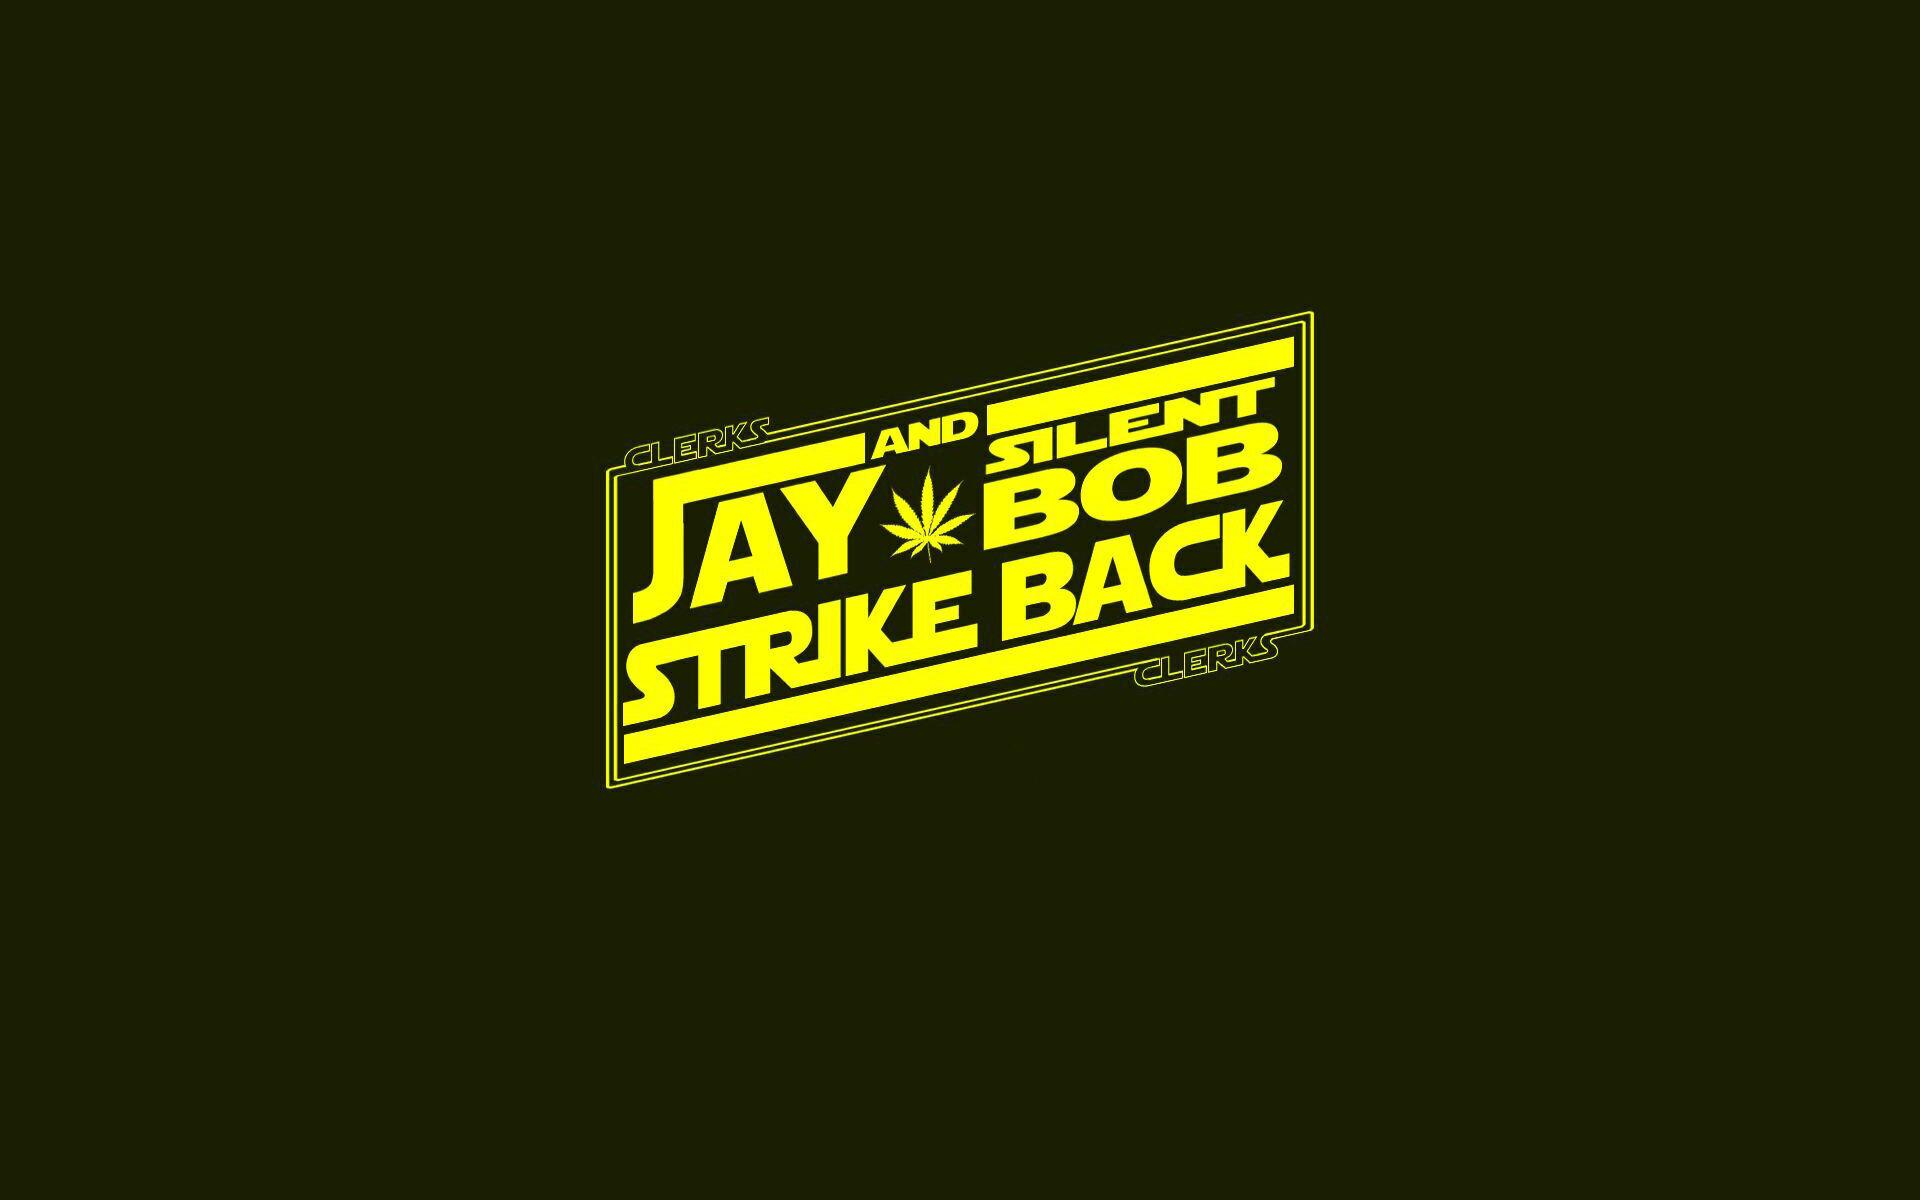 Jay And Silent Bob Strike Back Wallpapers 1920x1200 Desktop